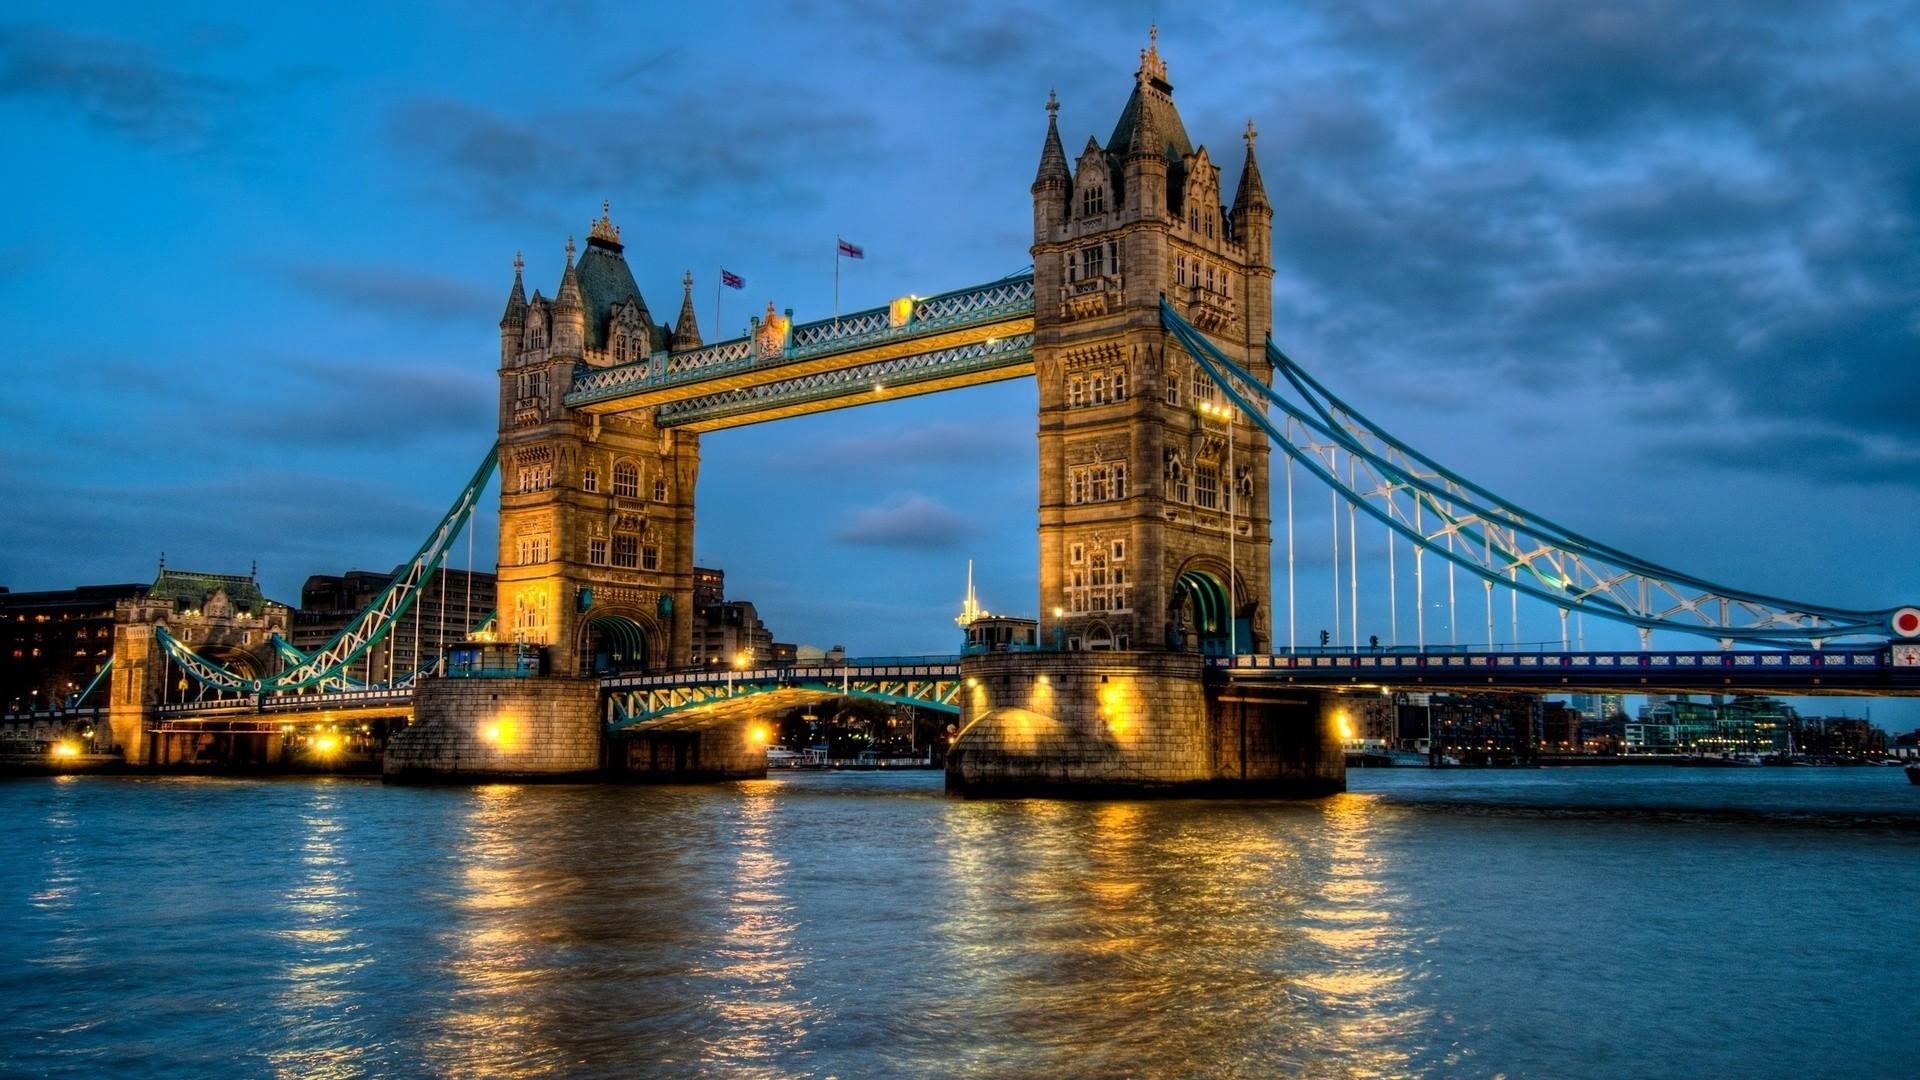 پل تاور بریج لندن